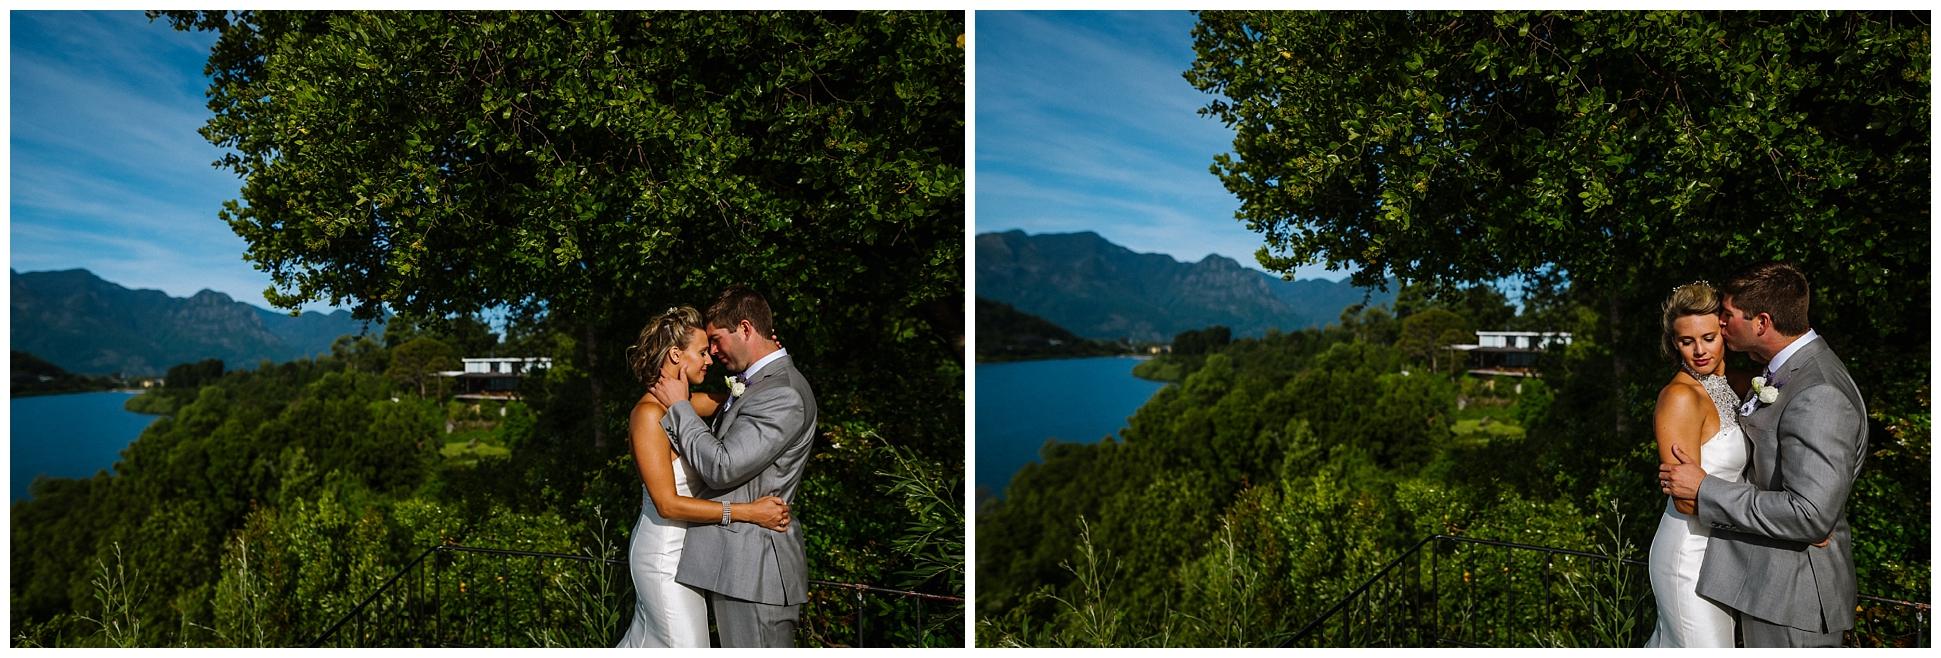 Cheilean-destination-adventure-wedding-florida-patagonia-pucon-santa-cruz-vsco_0116.jpg